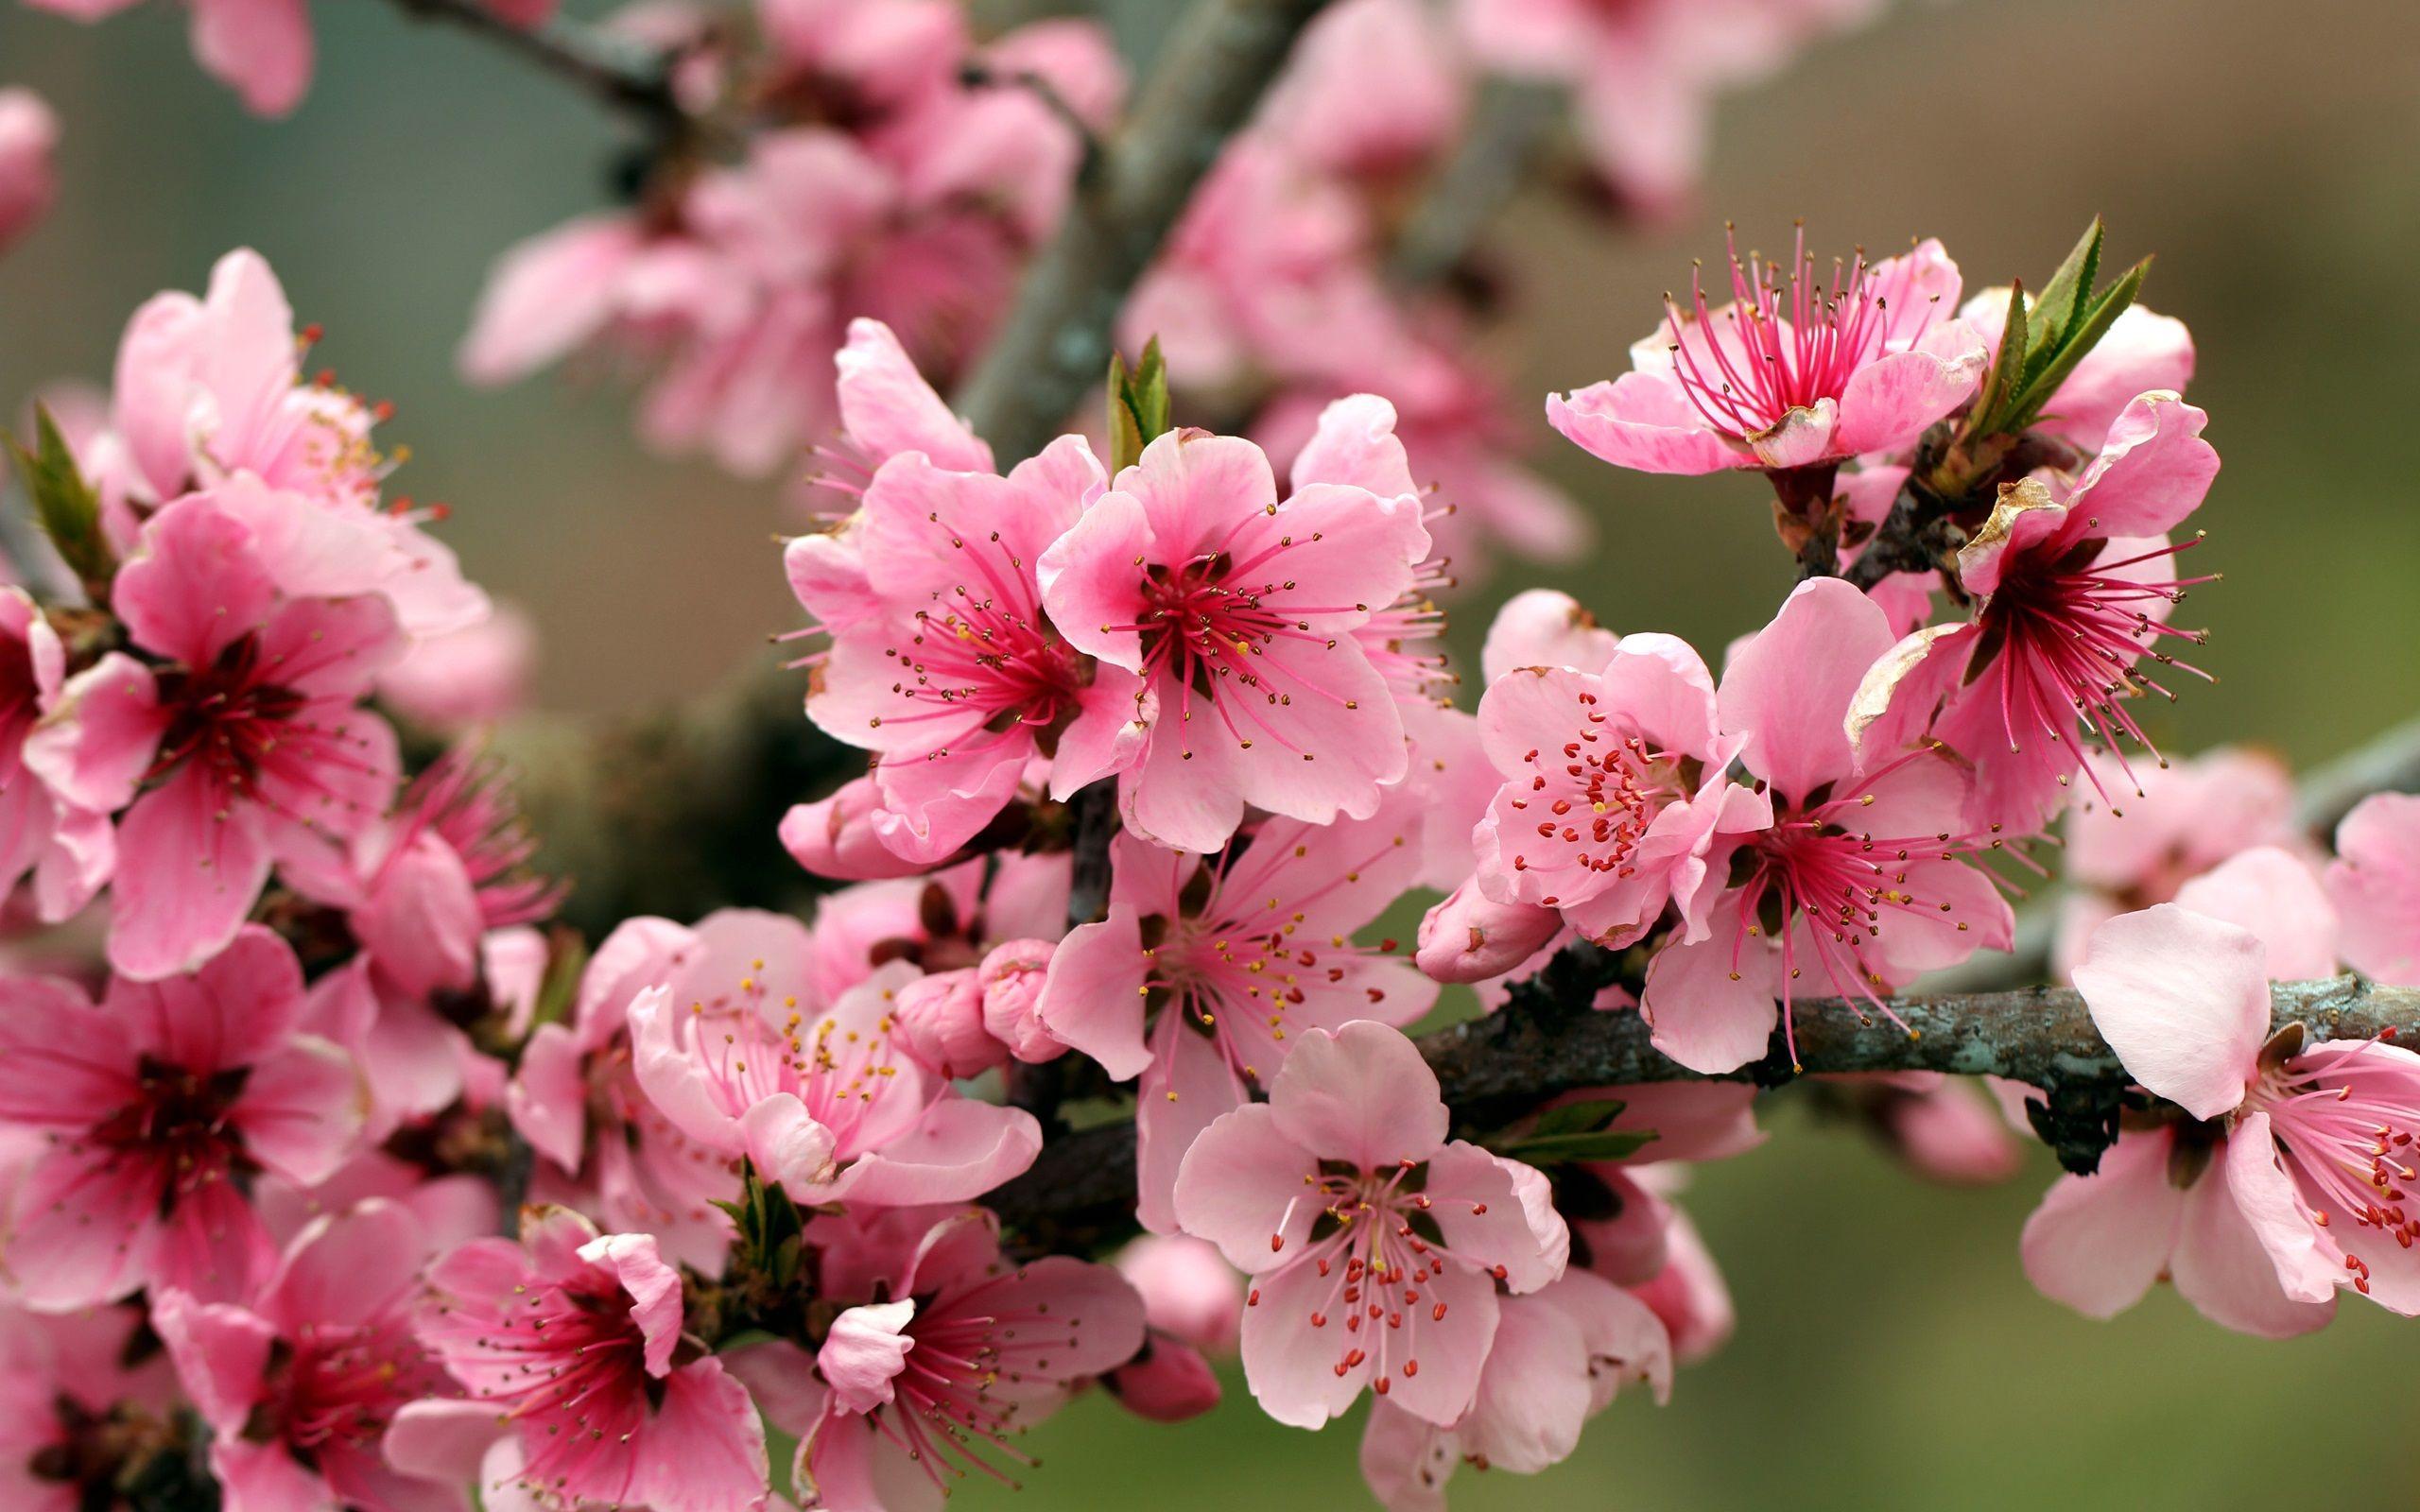 Pink Apple Blossom Isolated Flower Art Apple Blossom Tattoos Flower Painting